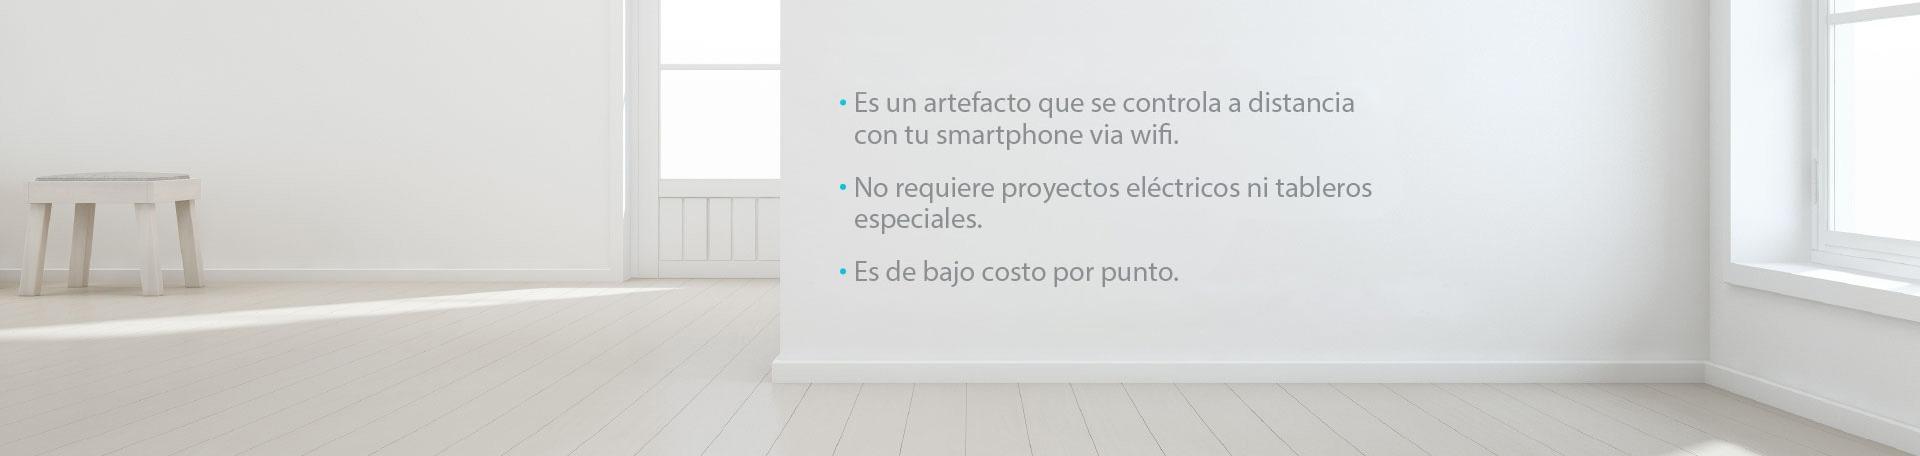 Smart-Switch-02